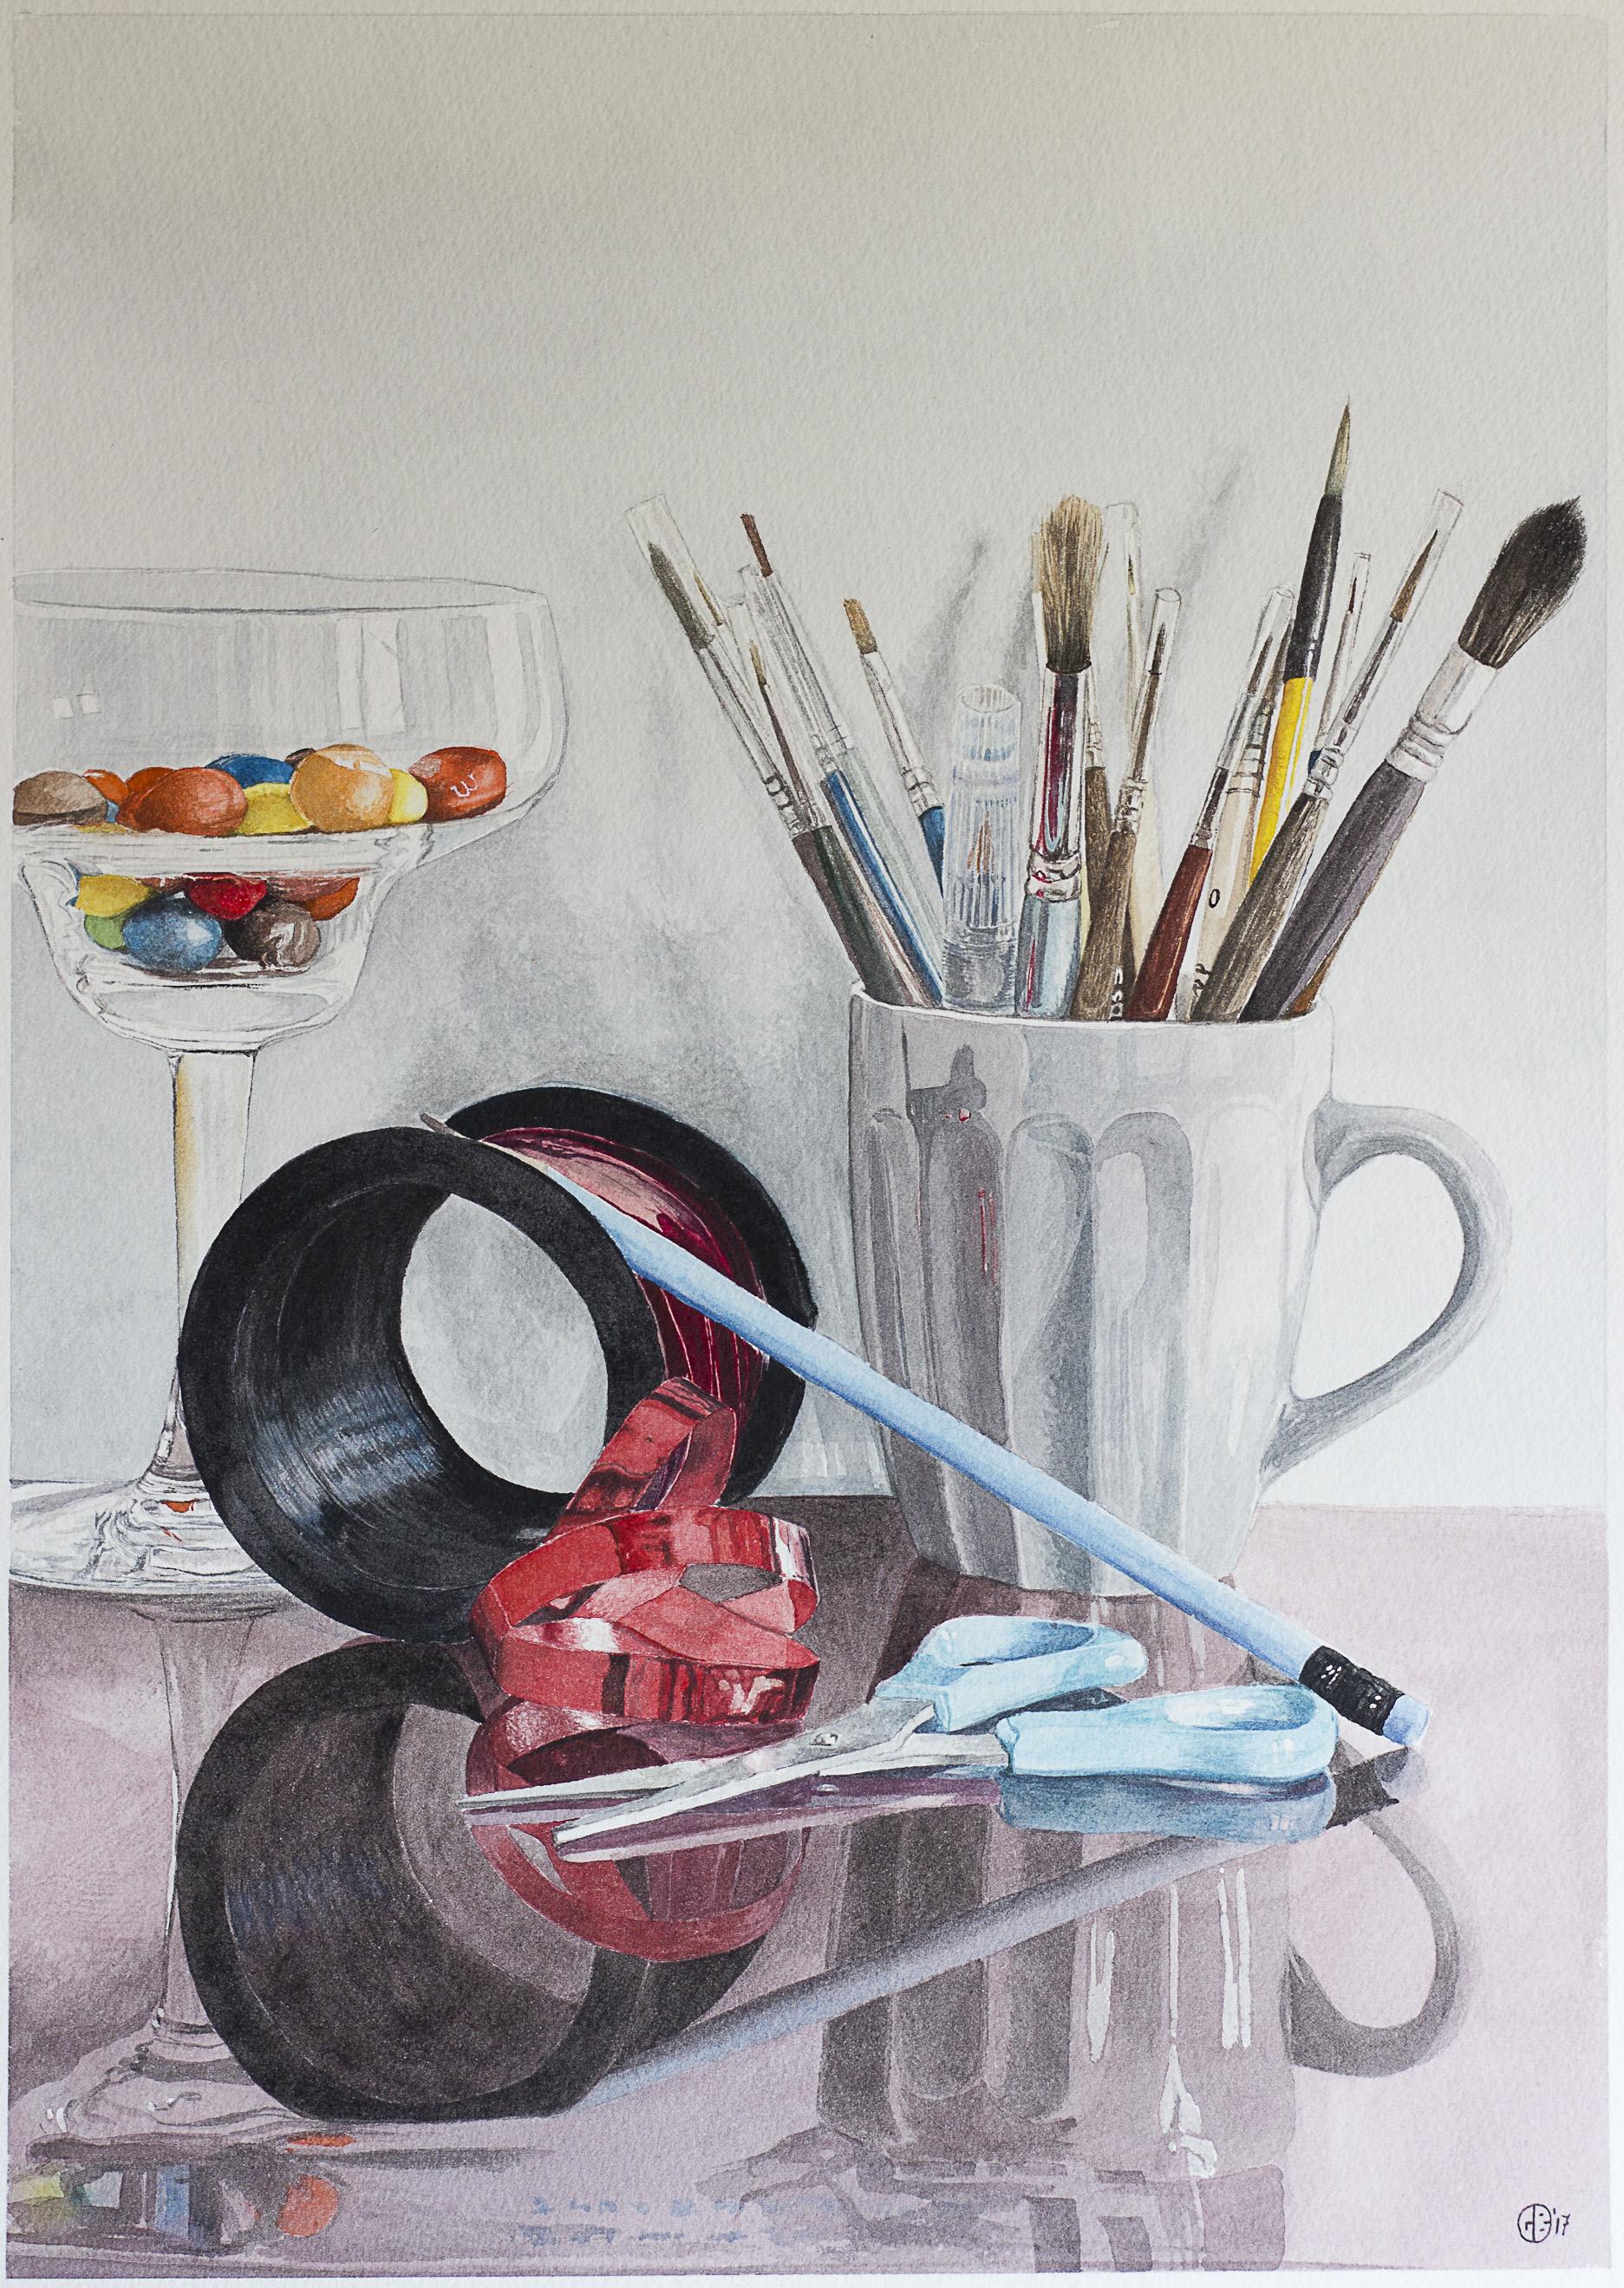 Giovanni Balzarani, The Red Ribbon, watercolor on paper, 42cm x 30cm,  http://giovannibalzarani.wixsite.com/jopaint